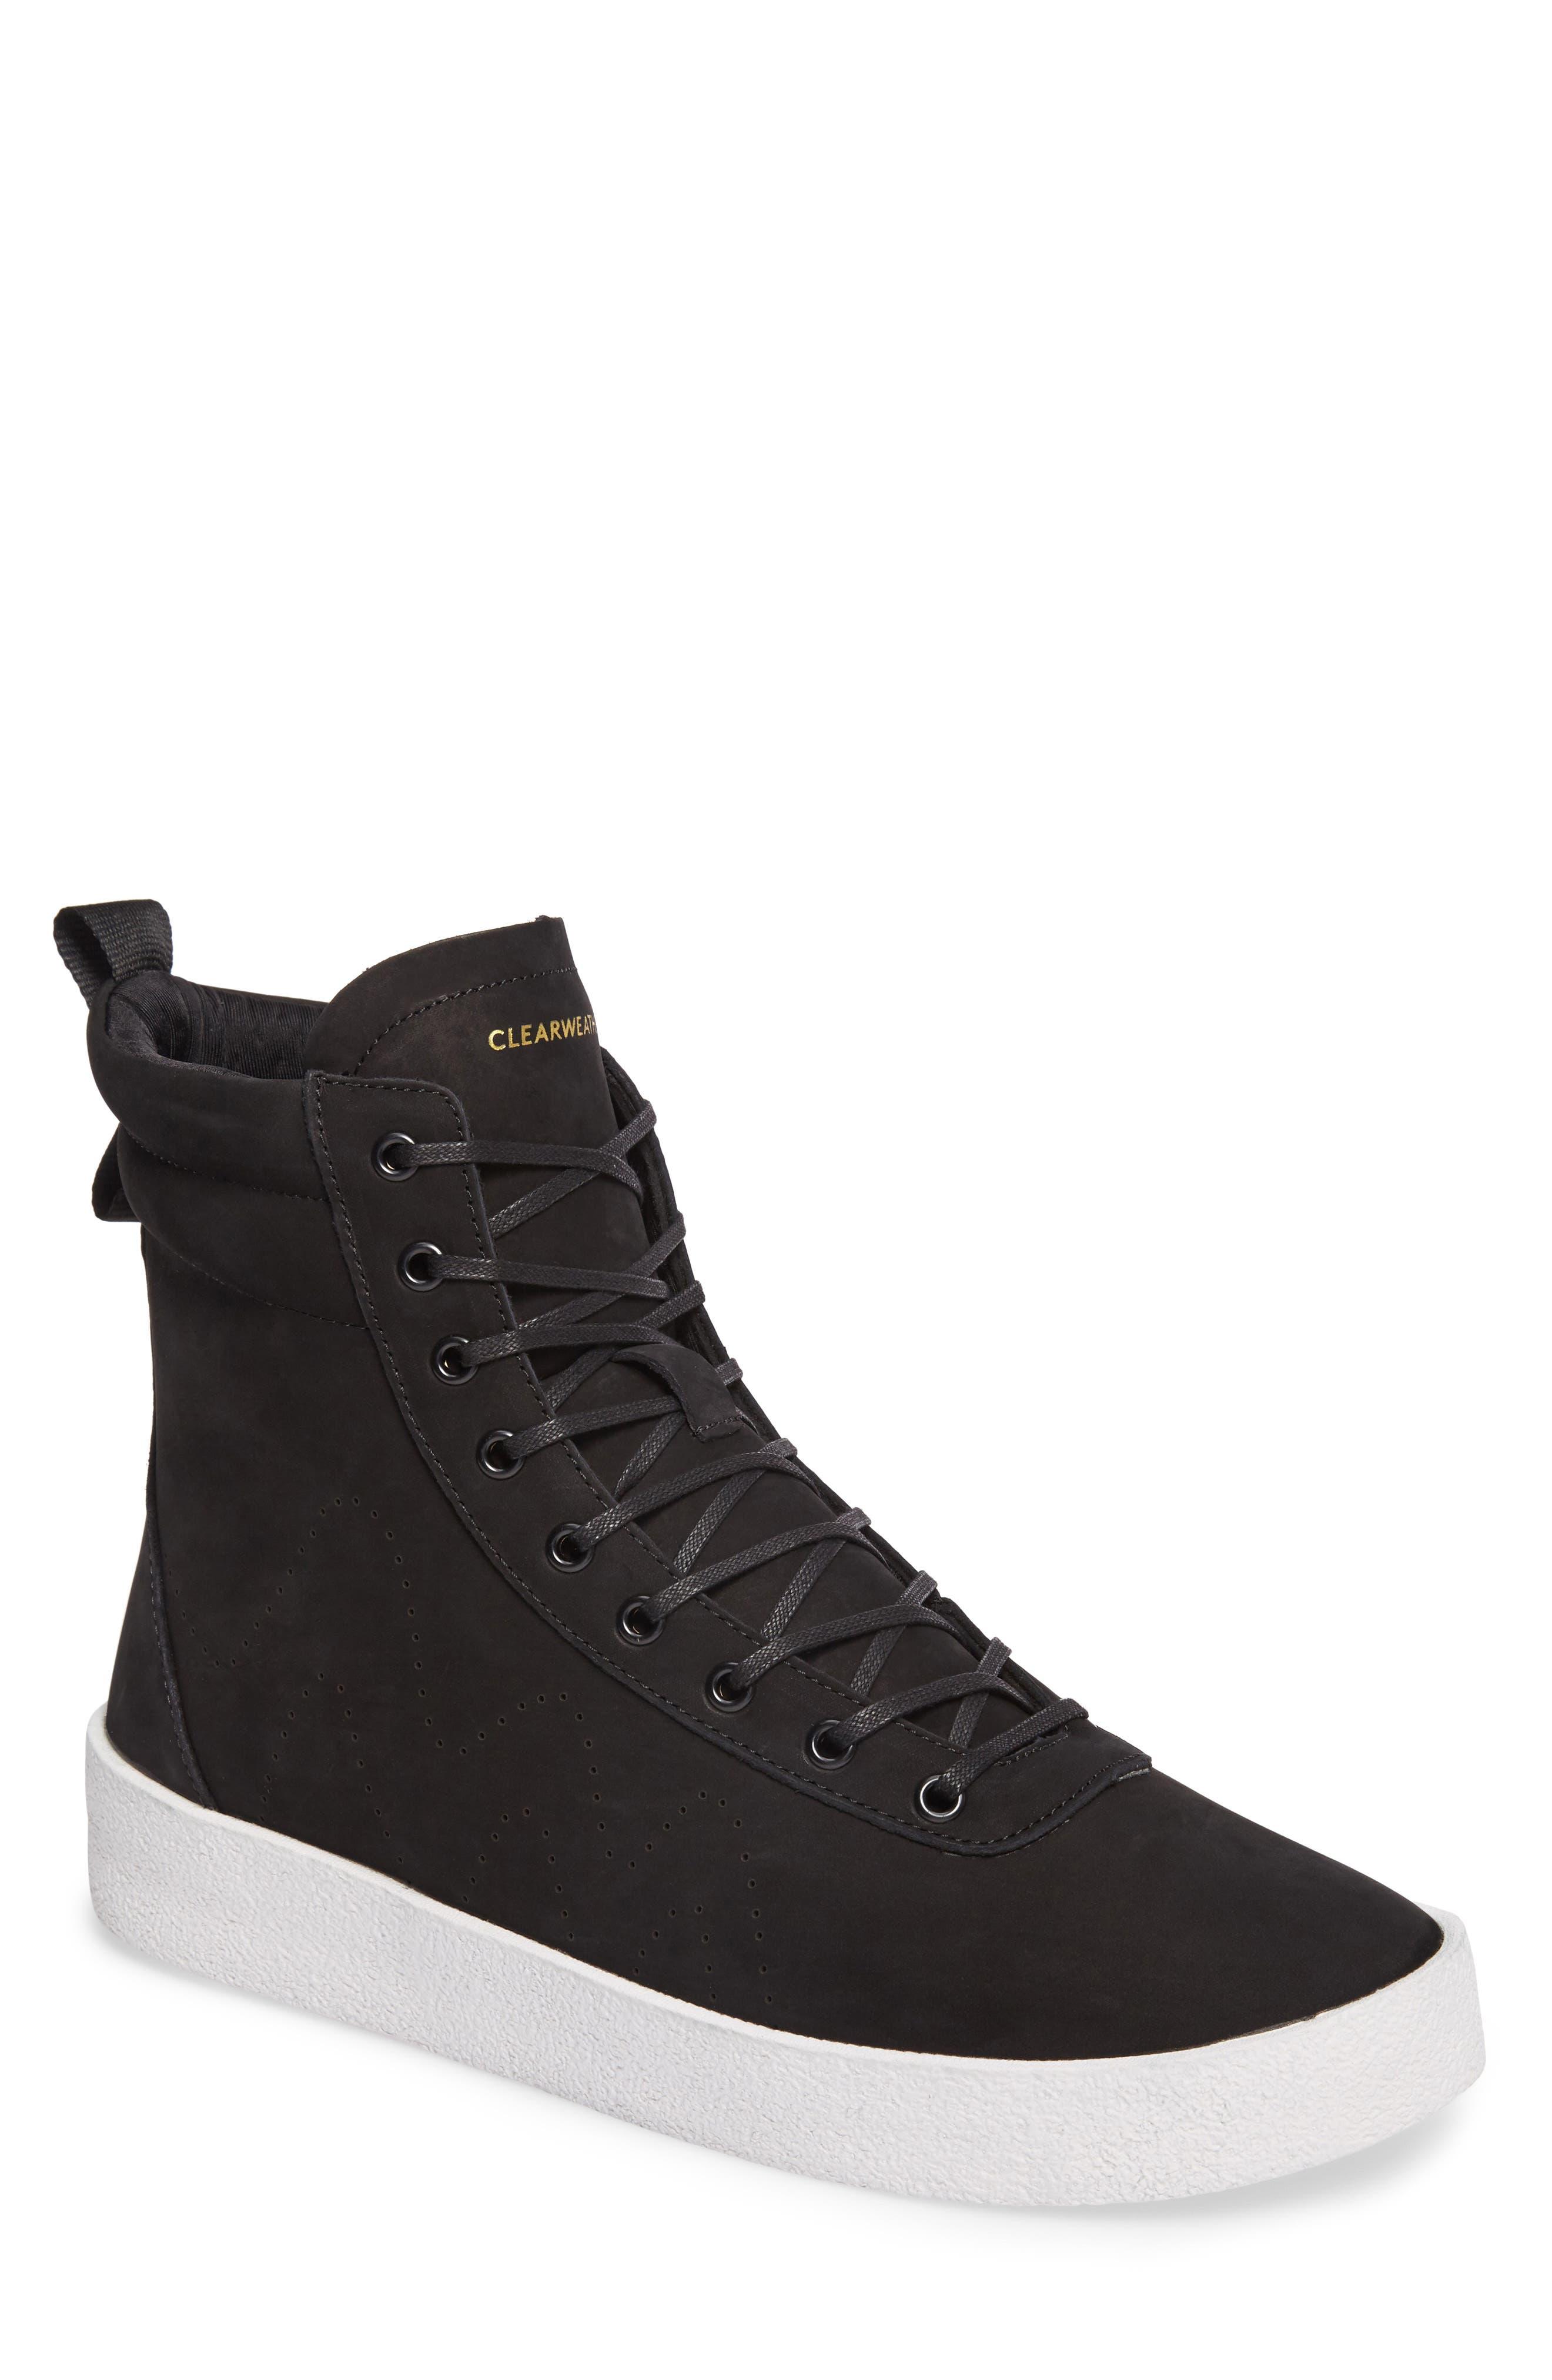 Highlander High Top Sneaker,                             Main thumbnail 1, color,                             001